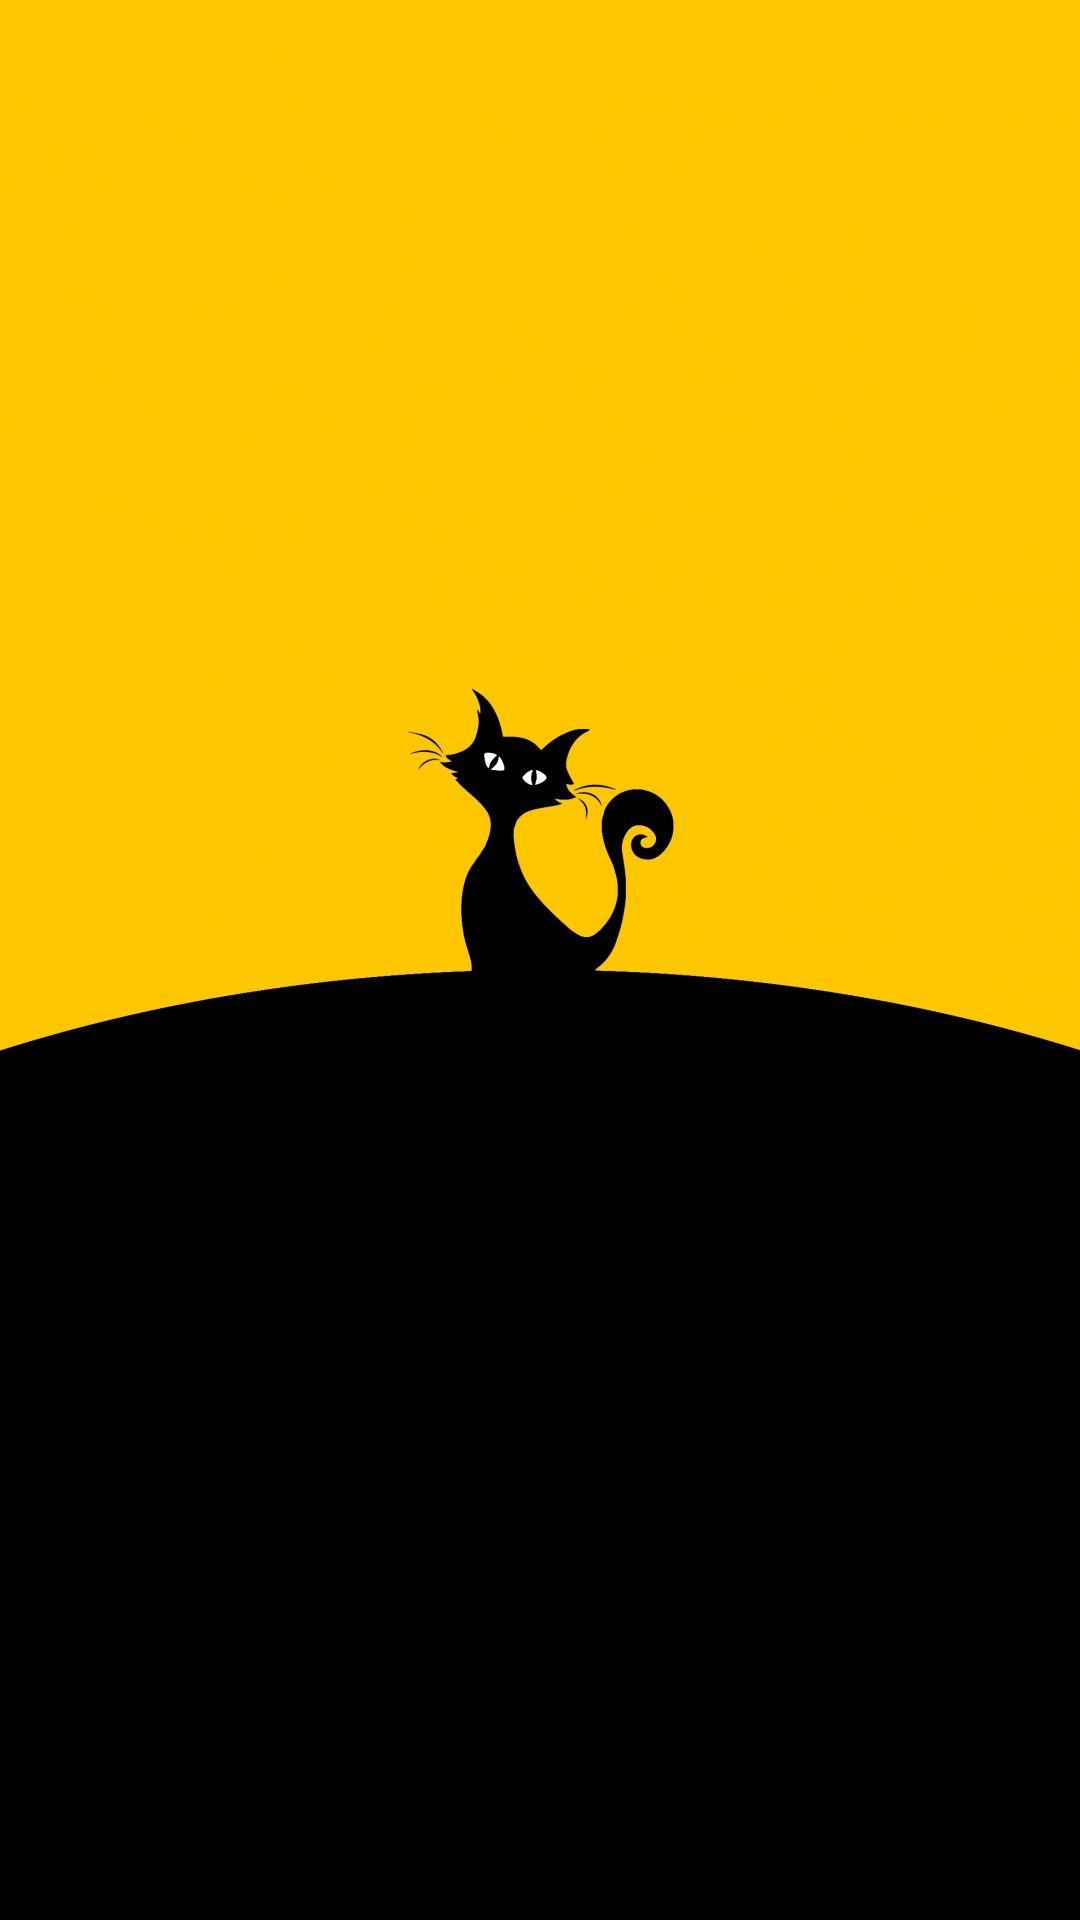 Minimal Cat Silhouette 1080x1920 Wallpaper Cat Wallpaper Yellow Cat Art Images